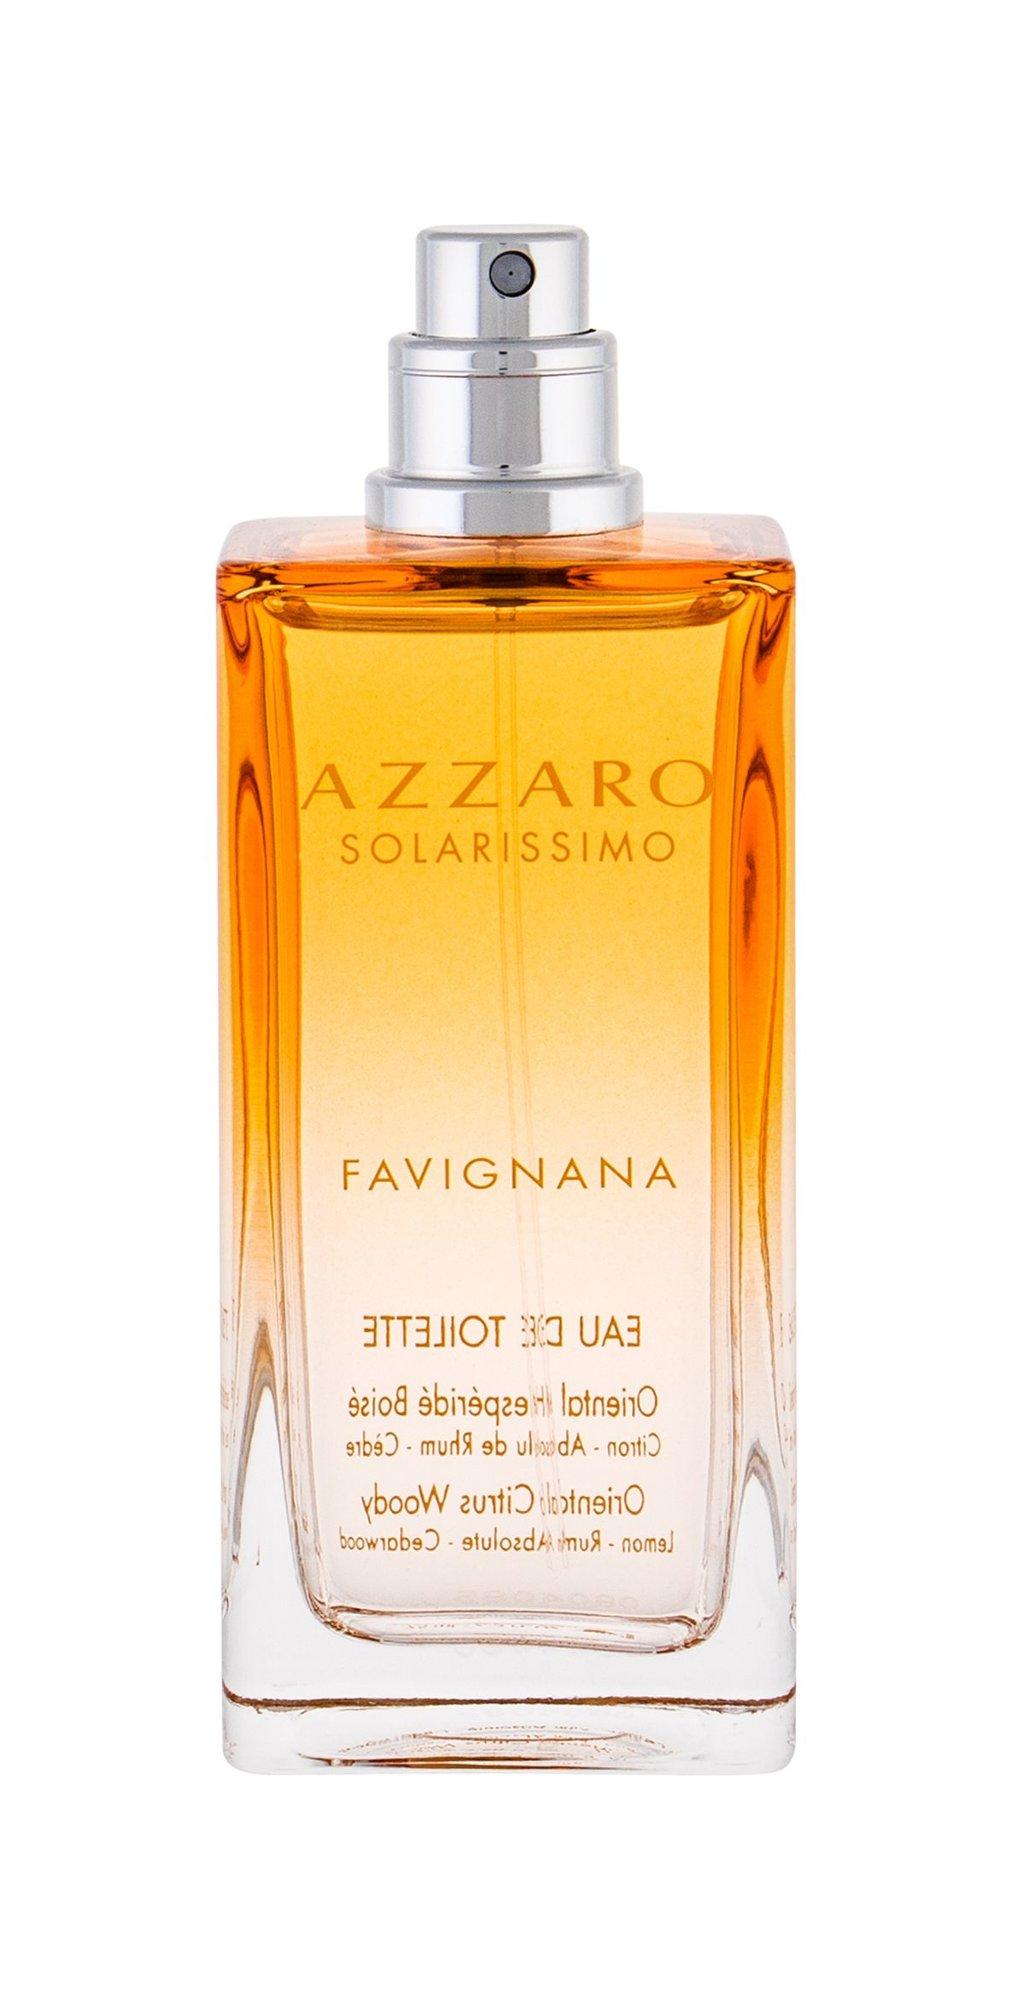 Azzaro Solarissimo Favignana, Toaletní voda 75ml, Tester